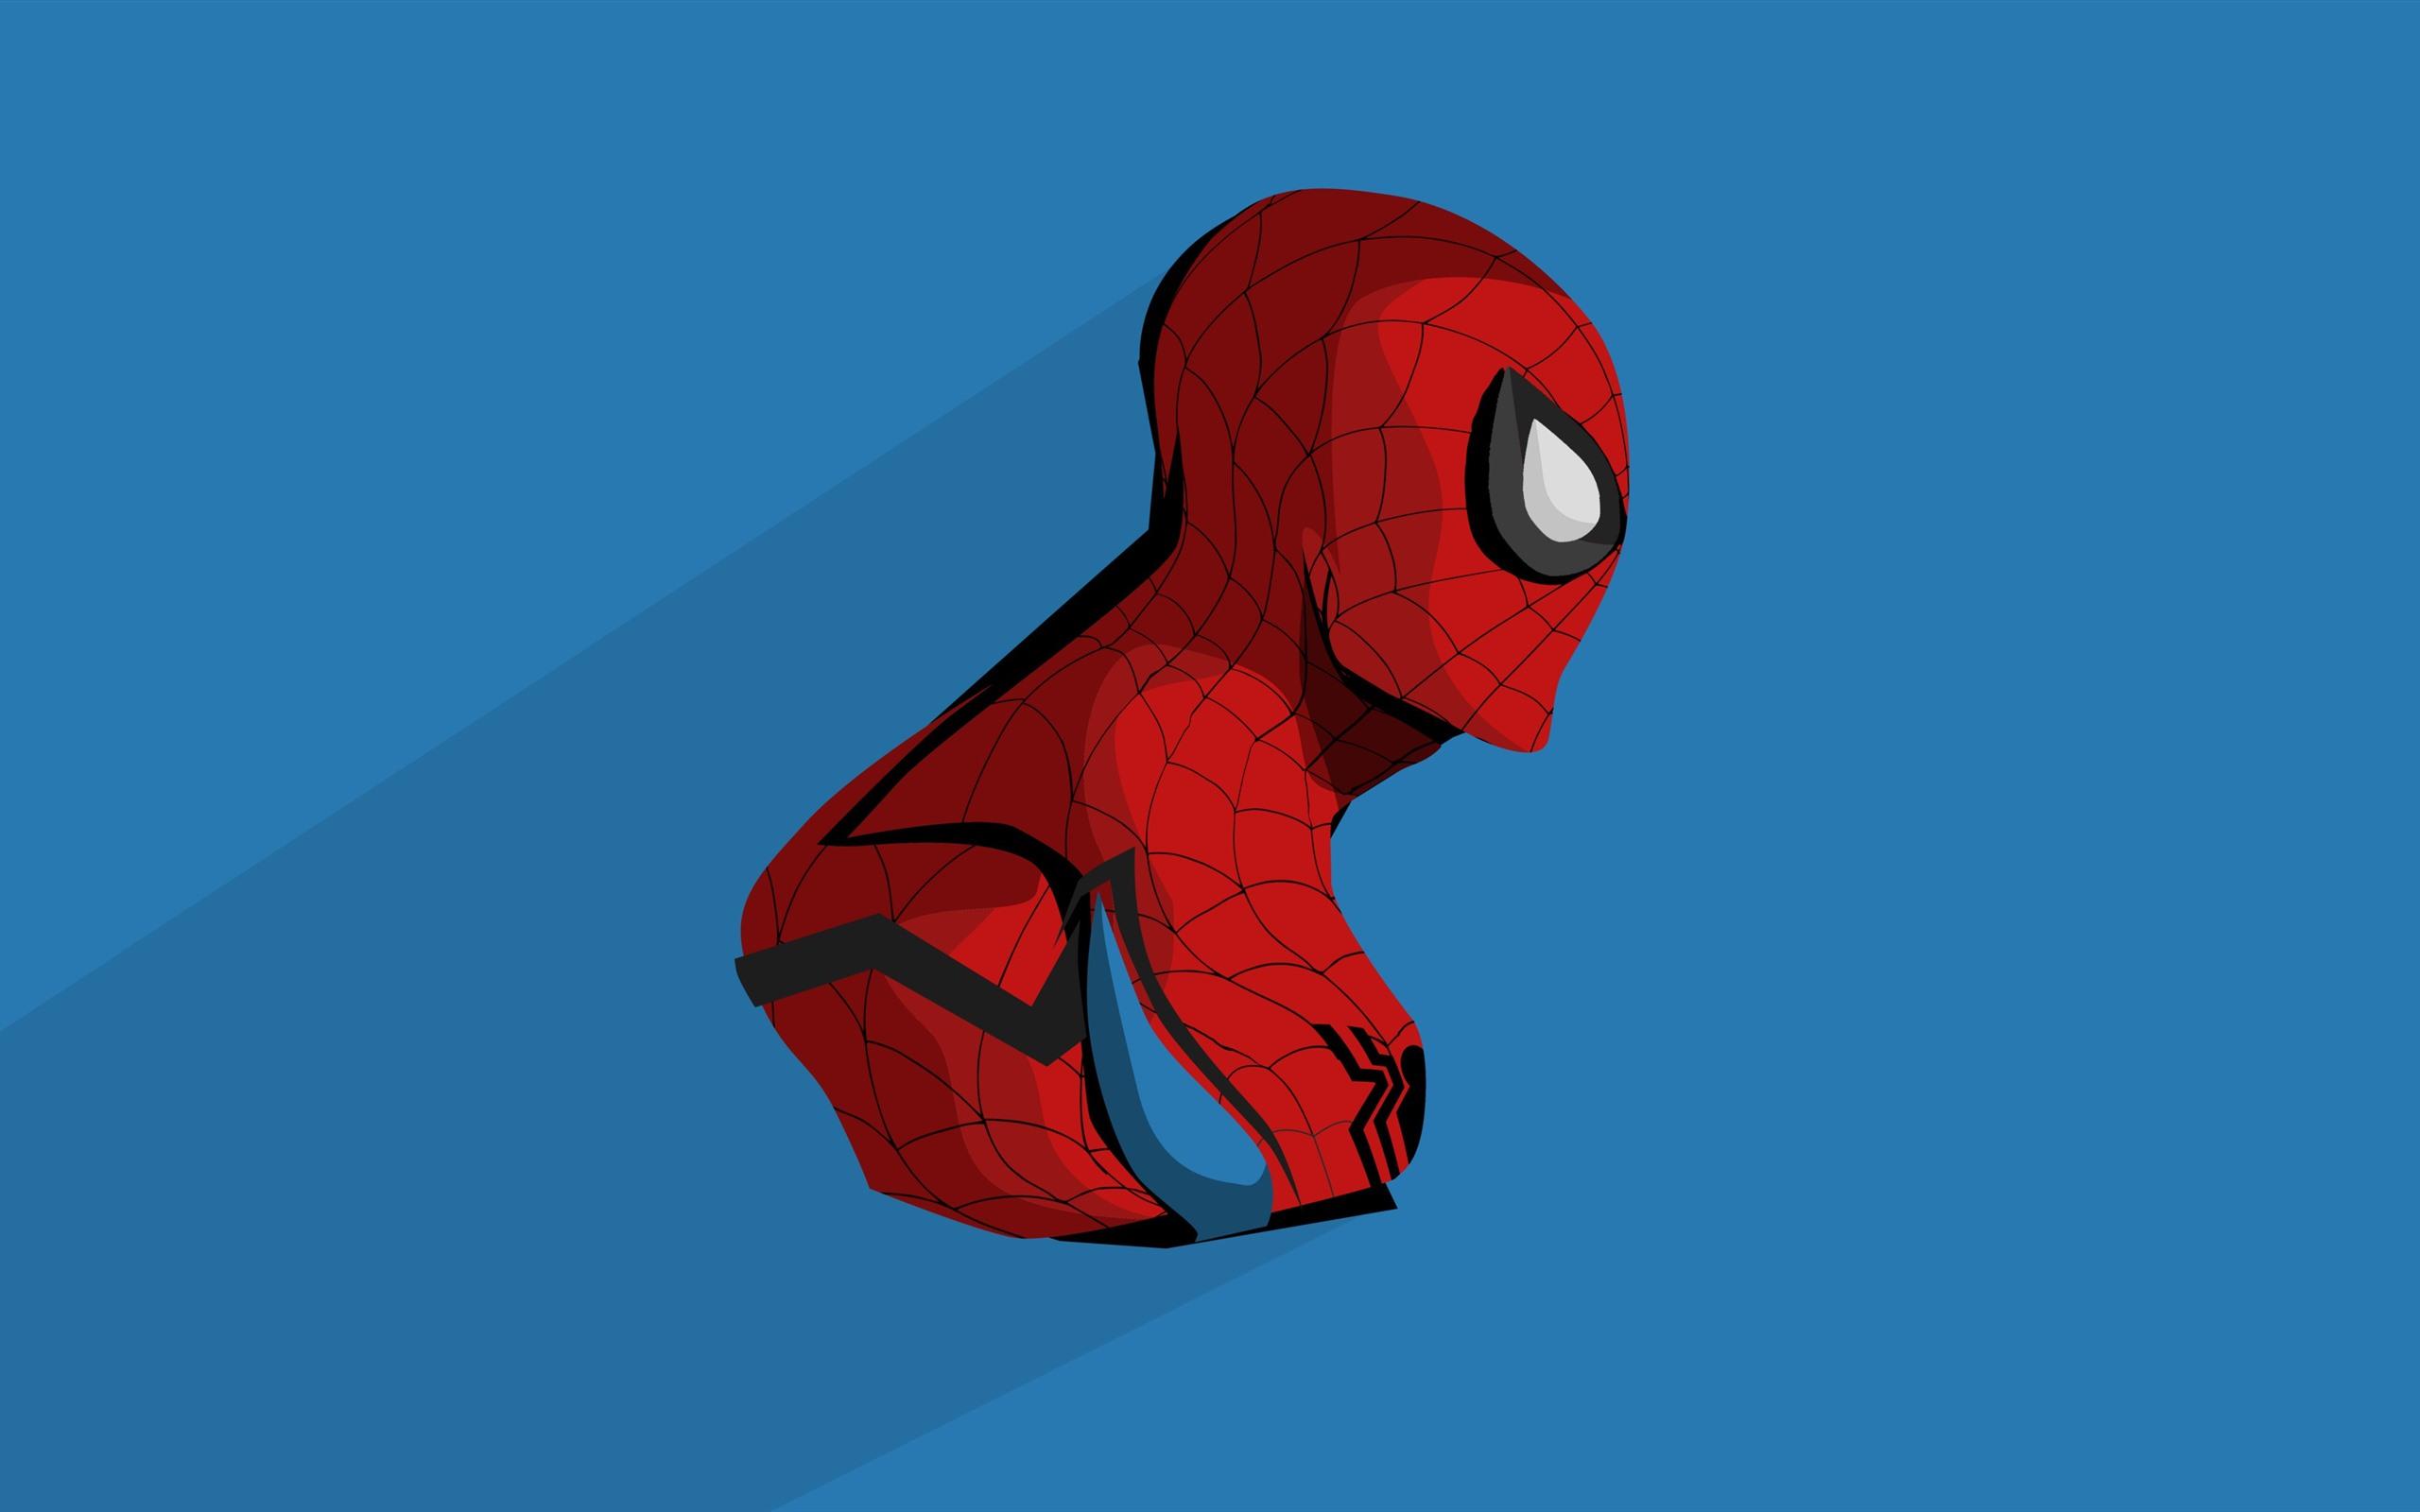 Wallpaper Spider Man Anime Blue Background 3840x2160 Uhd 4k